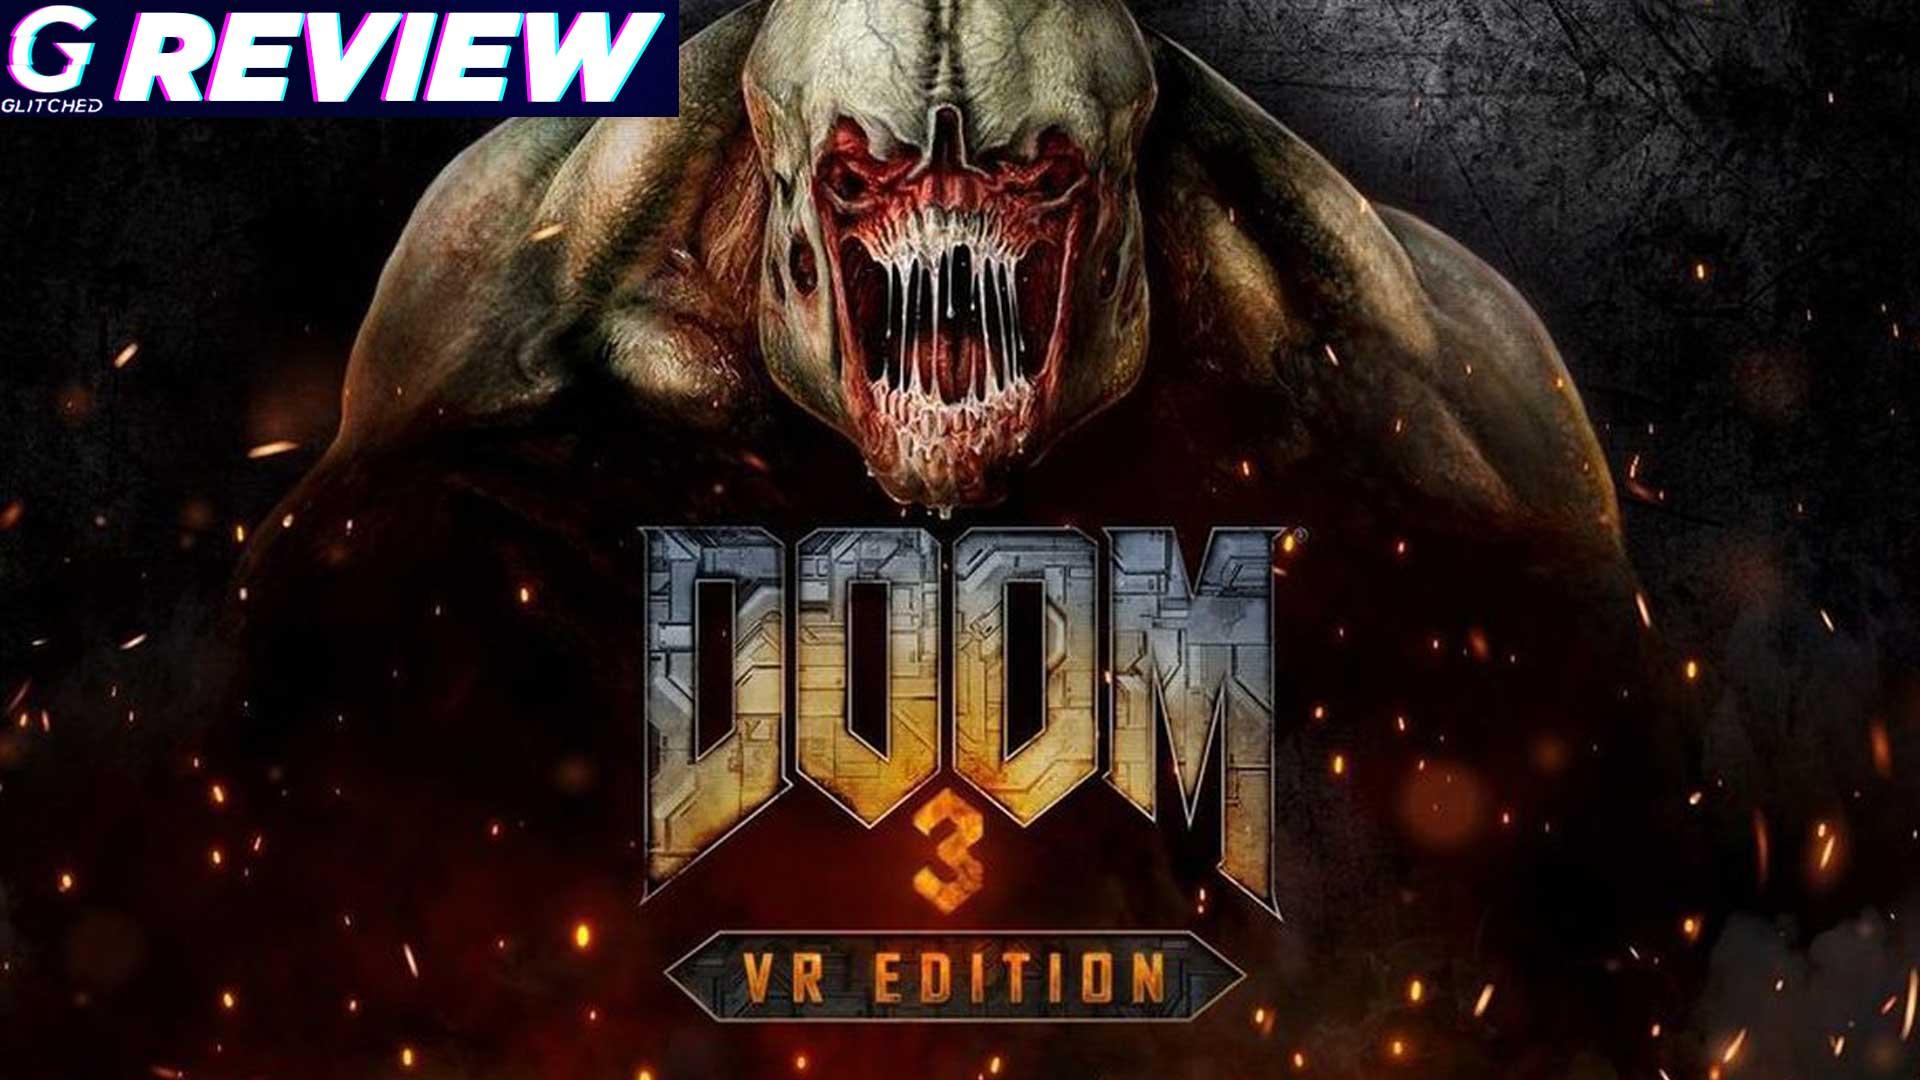 Doom 3 VR Edition Review